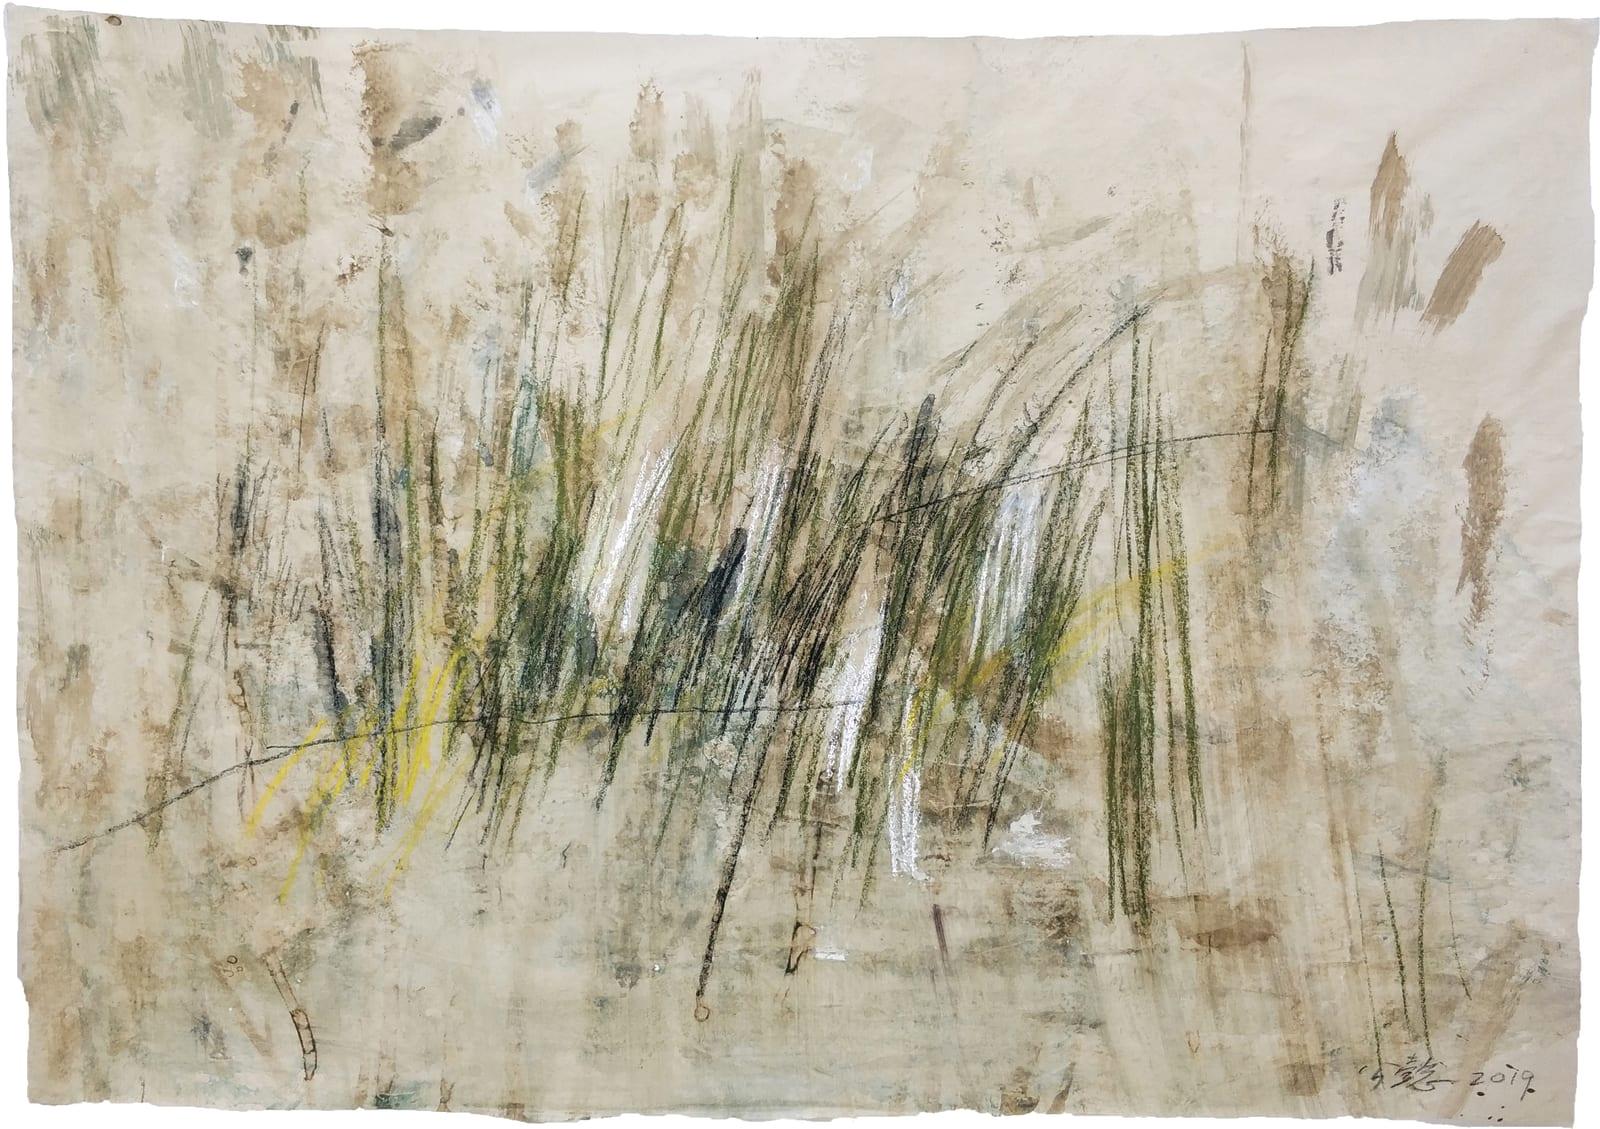 Wang Gongyi 王公懿, Leaves of Grass No.9 草葉集之九, 2019